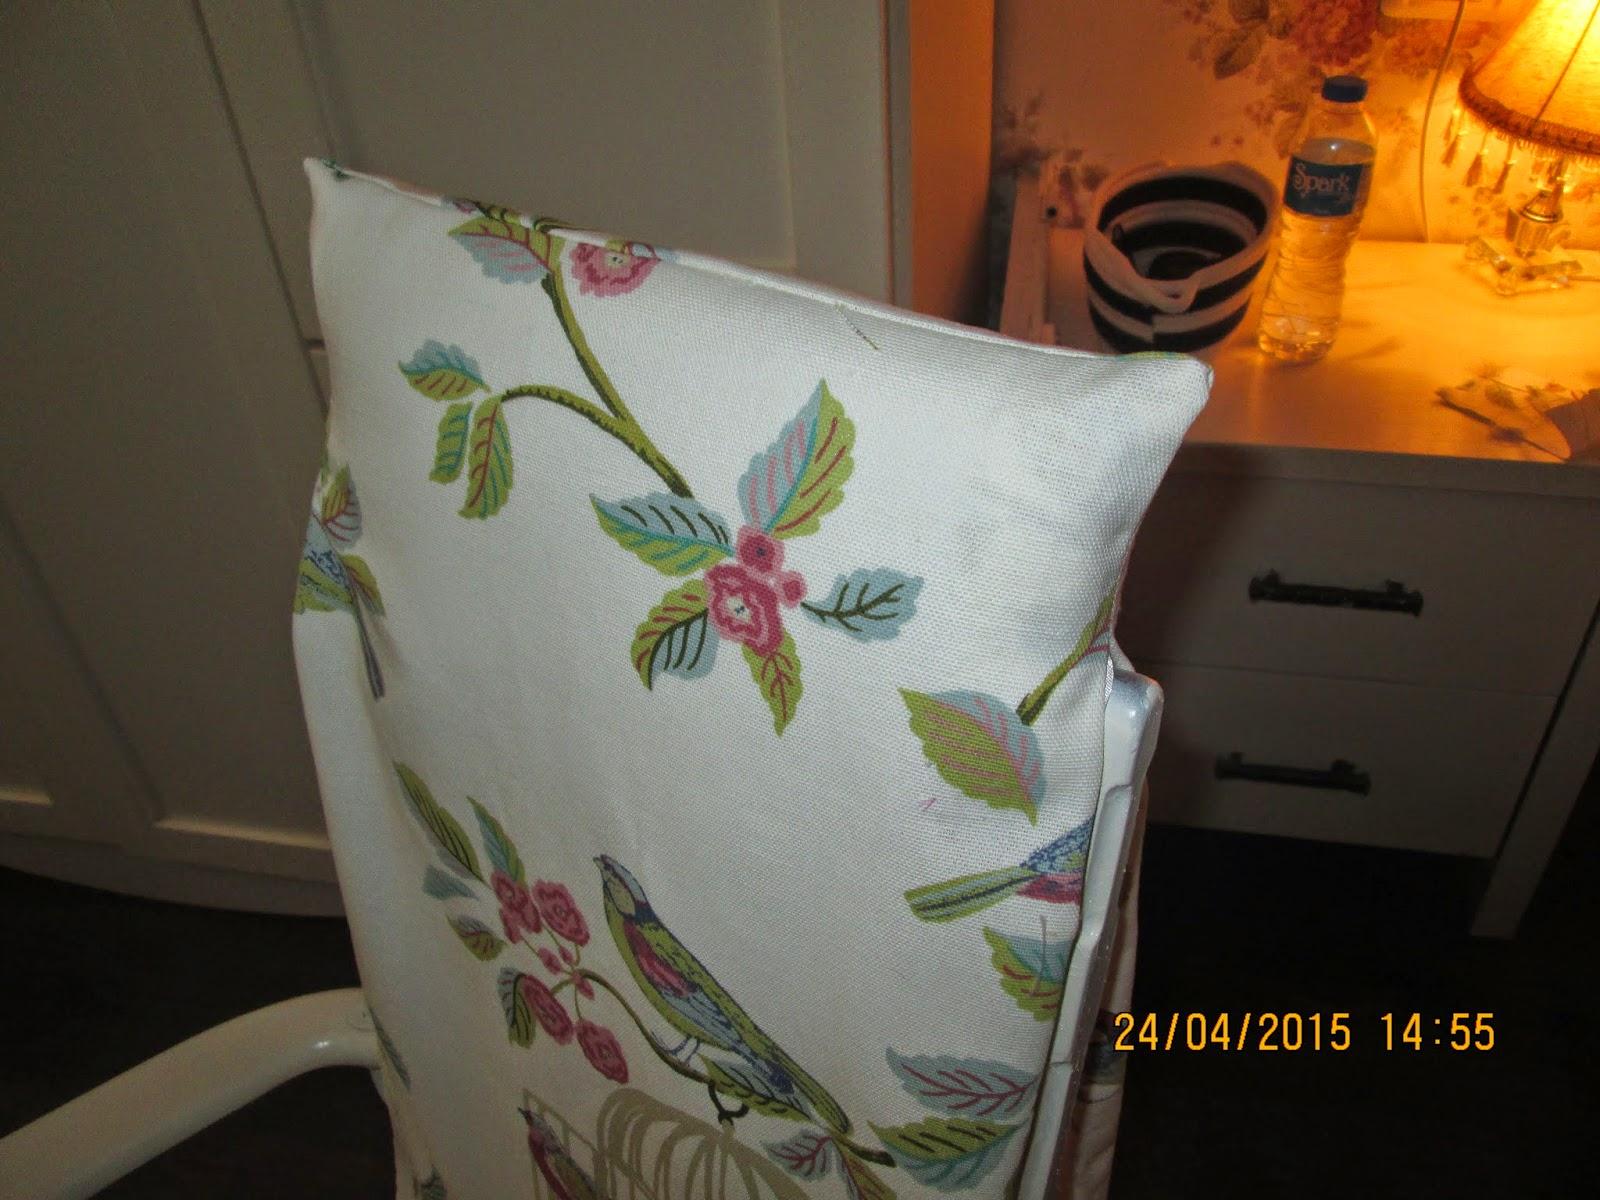 IMG 0049 - שדרוג כורסא ישנה